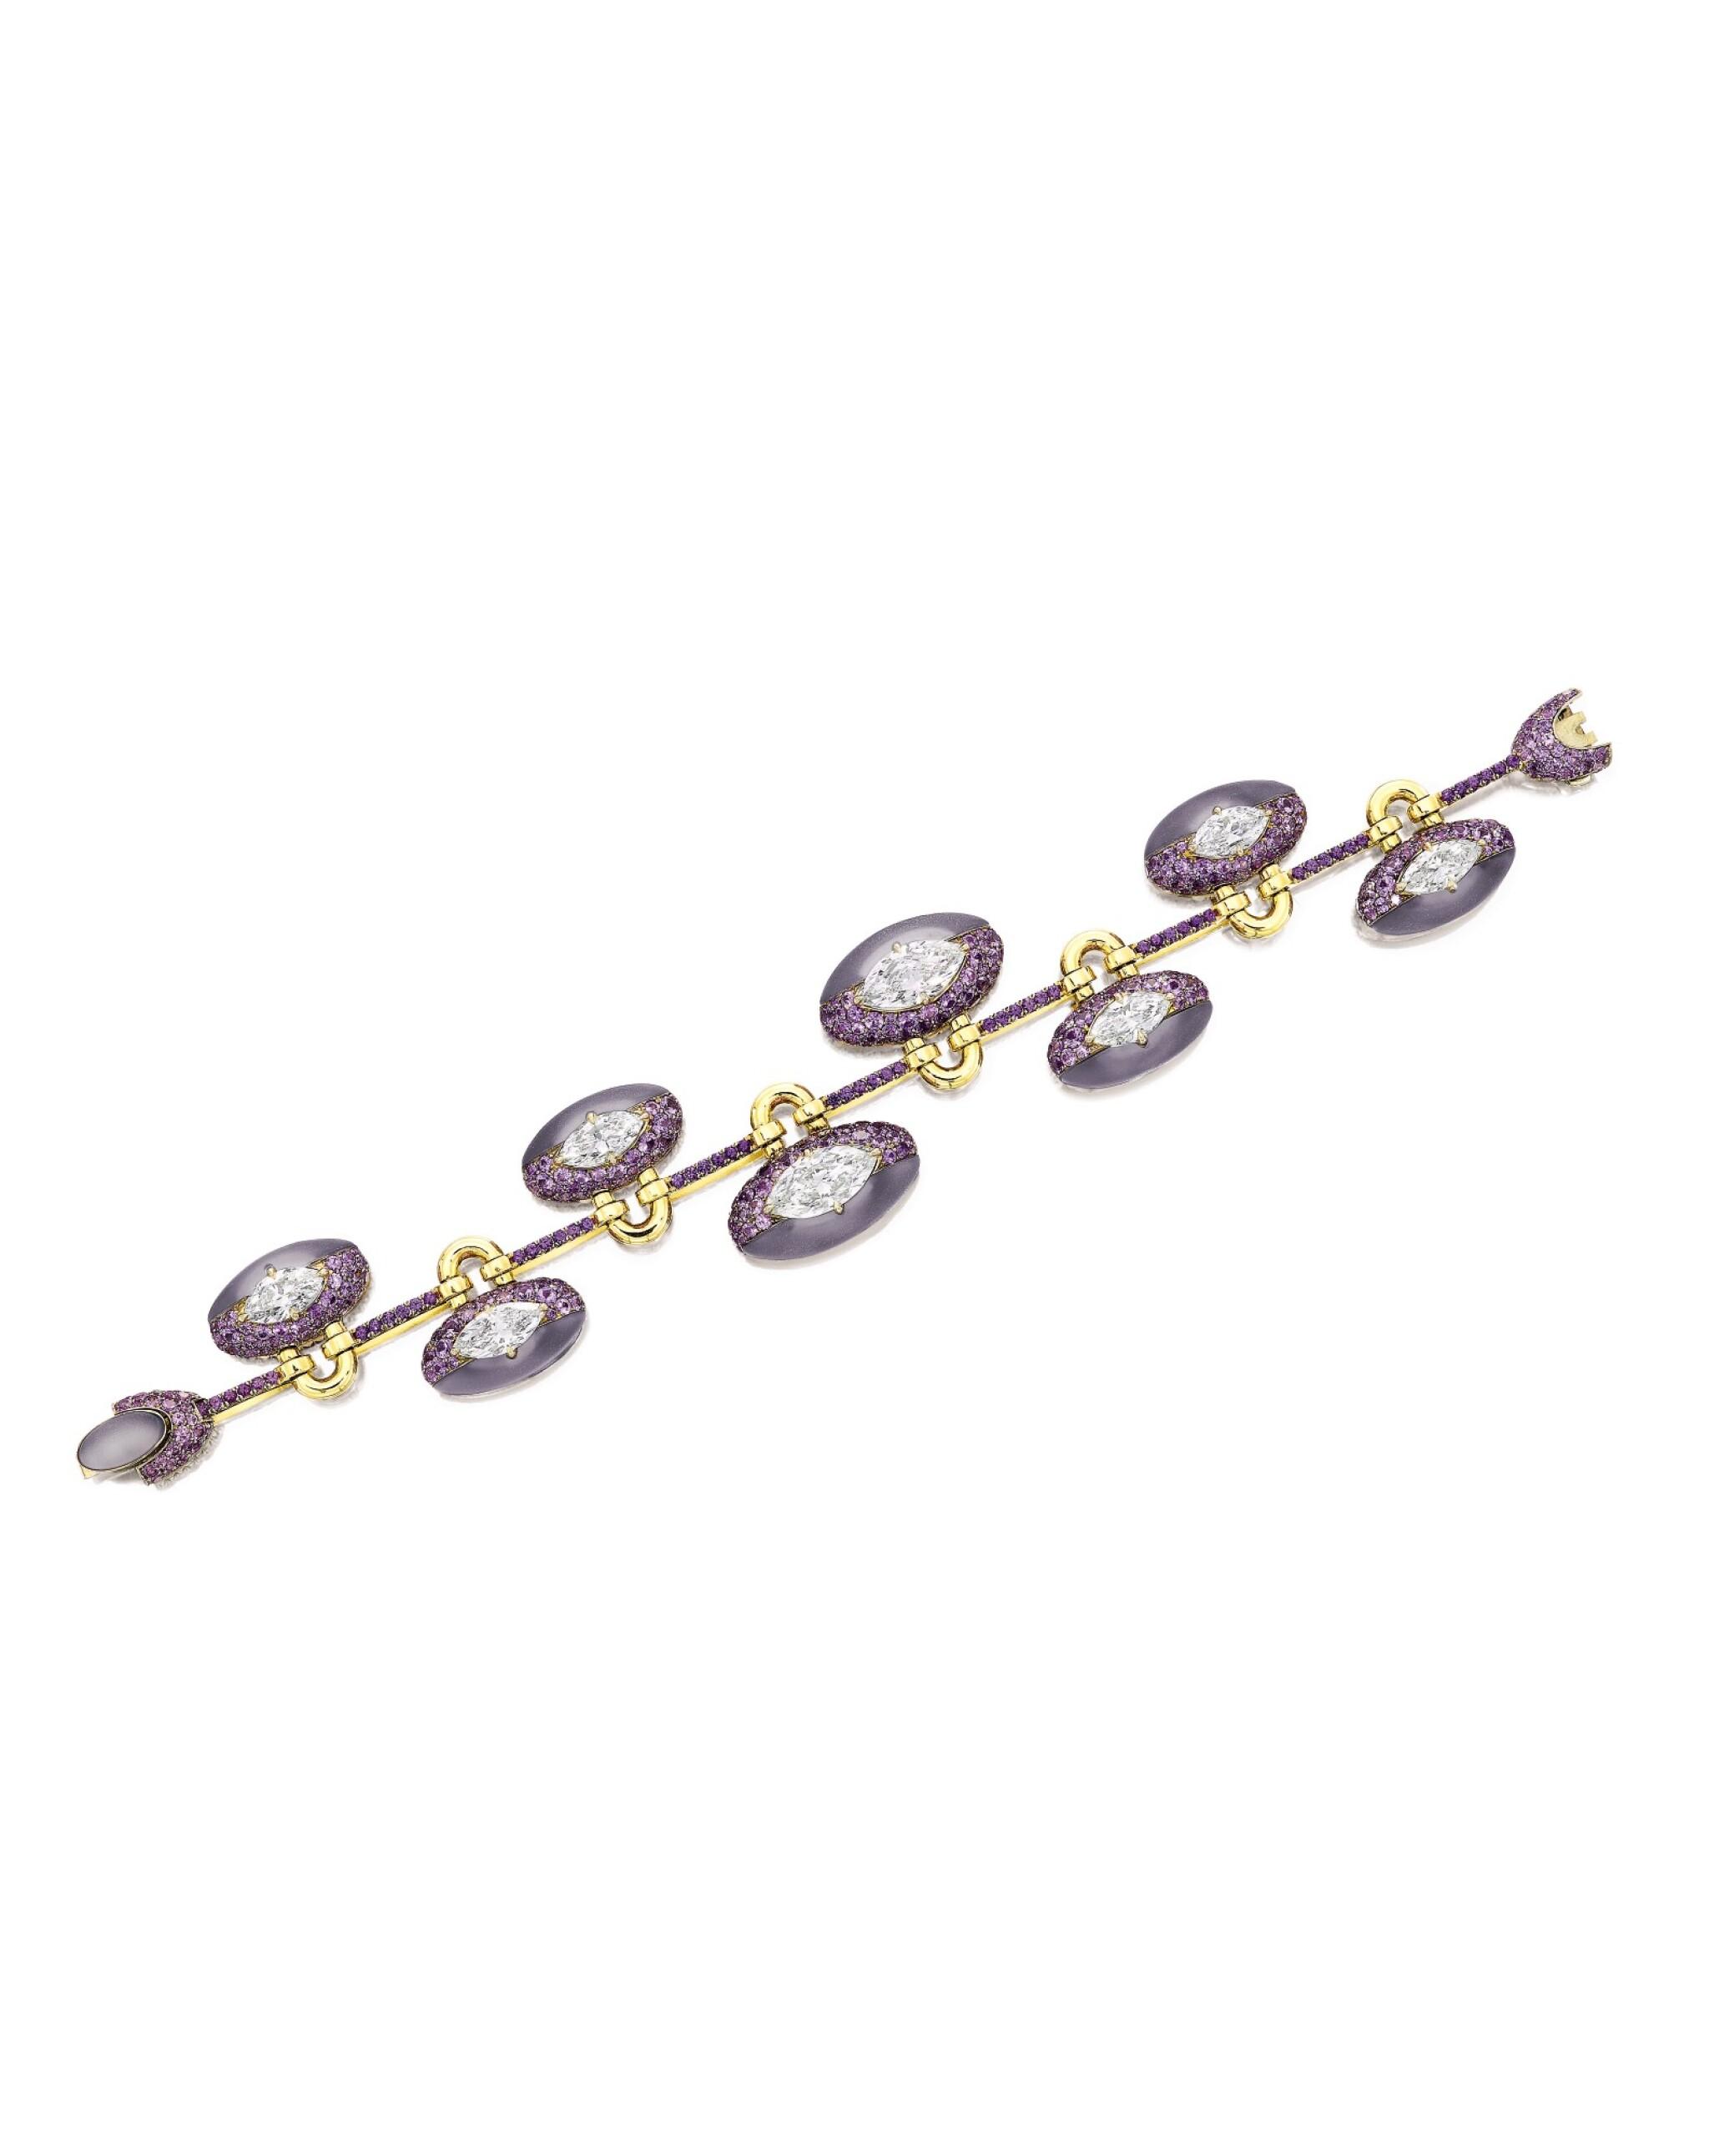 View full screen - View 1 of Lot 1654. Sotheby's Diamonds by Joseph Ramsay   'Padlock' Diamond, Chalcedony and Purple Sapphire Bracelet   「蘇富比鑽石」Joseph Ramsay設計  「同心扣」鑽石 配 玉髓 及 紫色剛玉 手鏈 (  八顆鑽石共重10.13克拉 ).